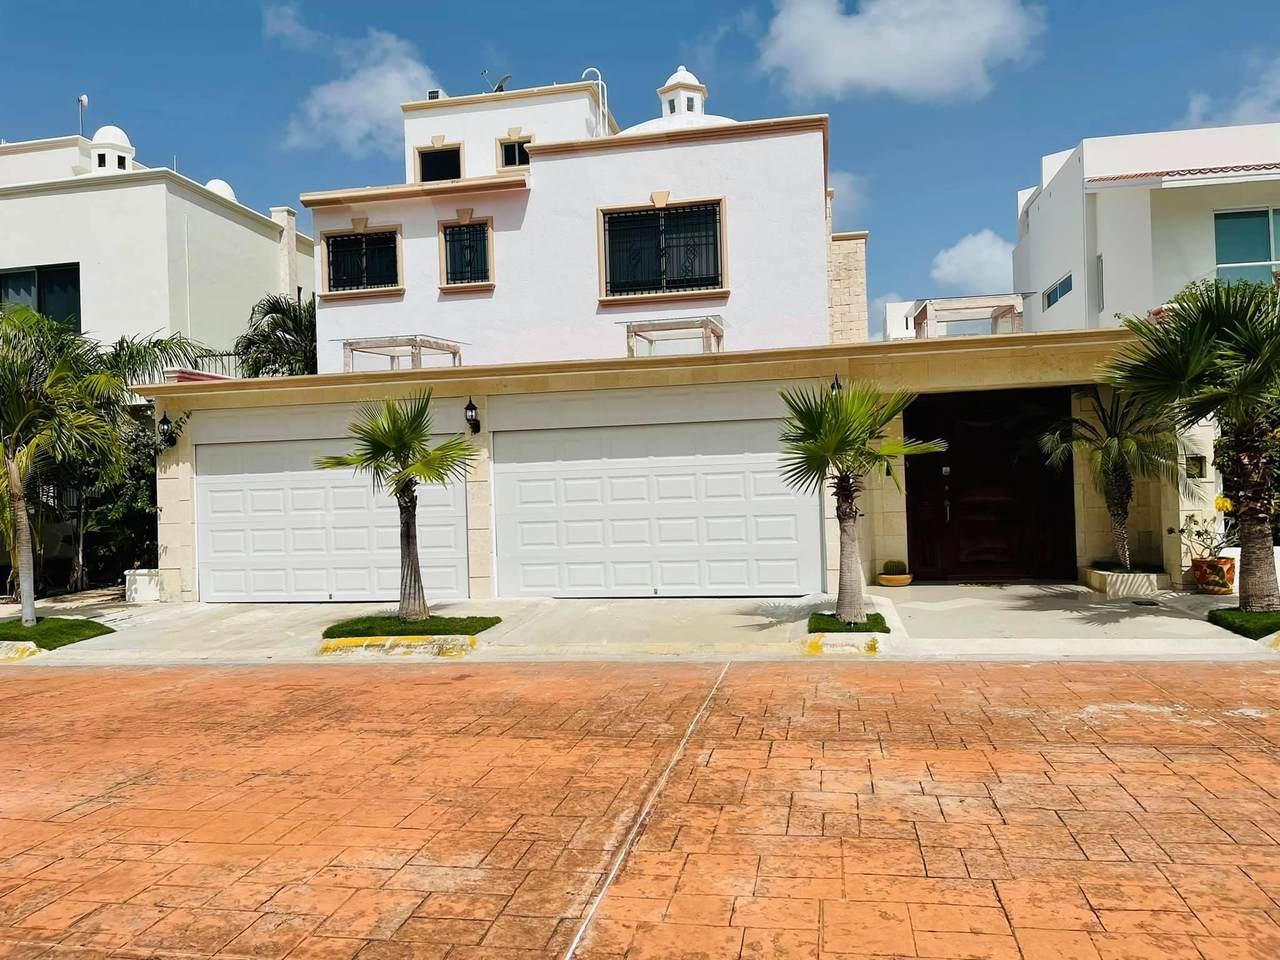 77504 Cozumel,Cancun,Mx - Photo 1